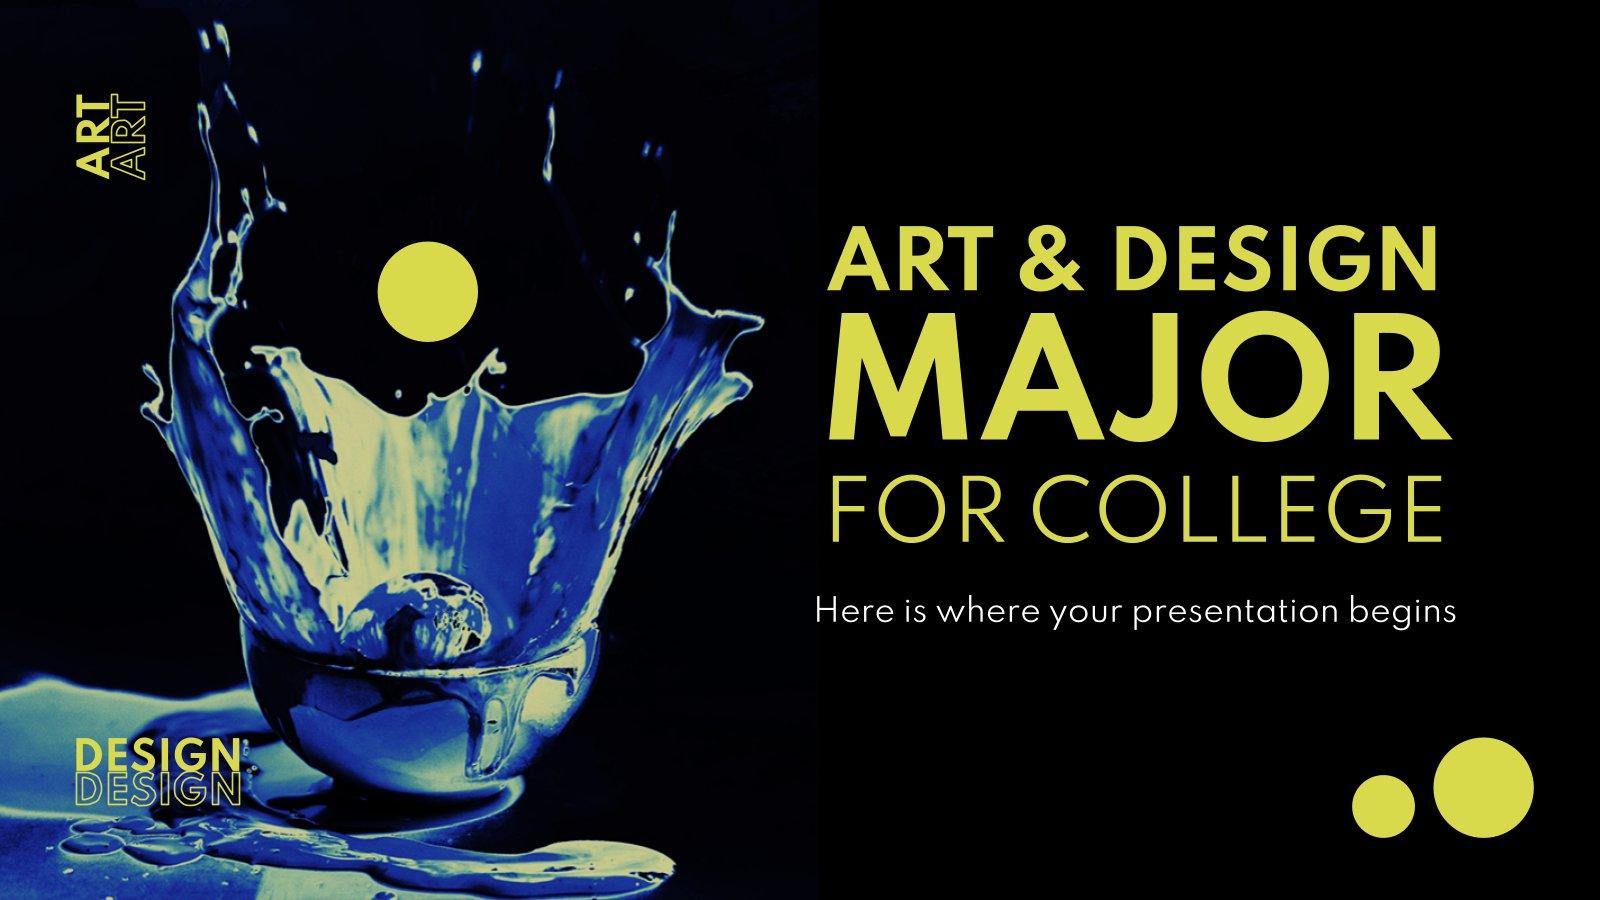 Art & Design Major for College presentation template